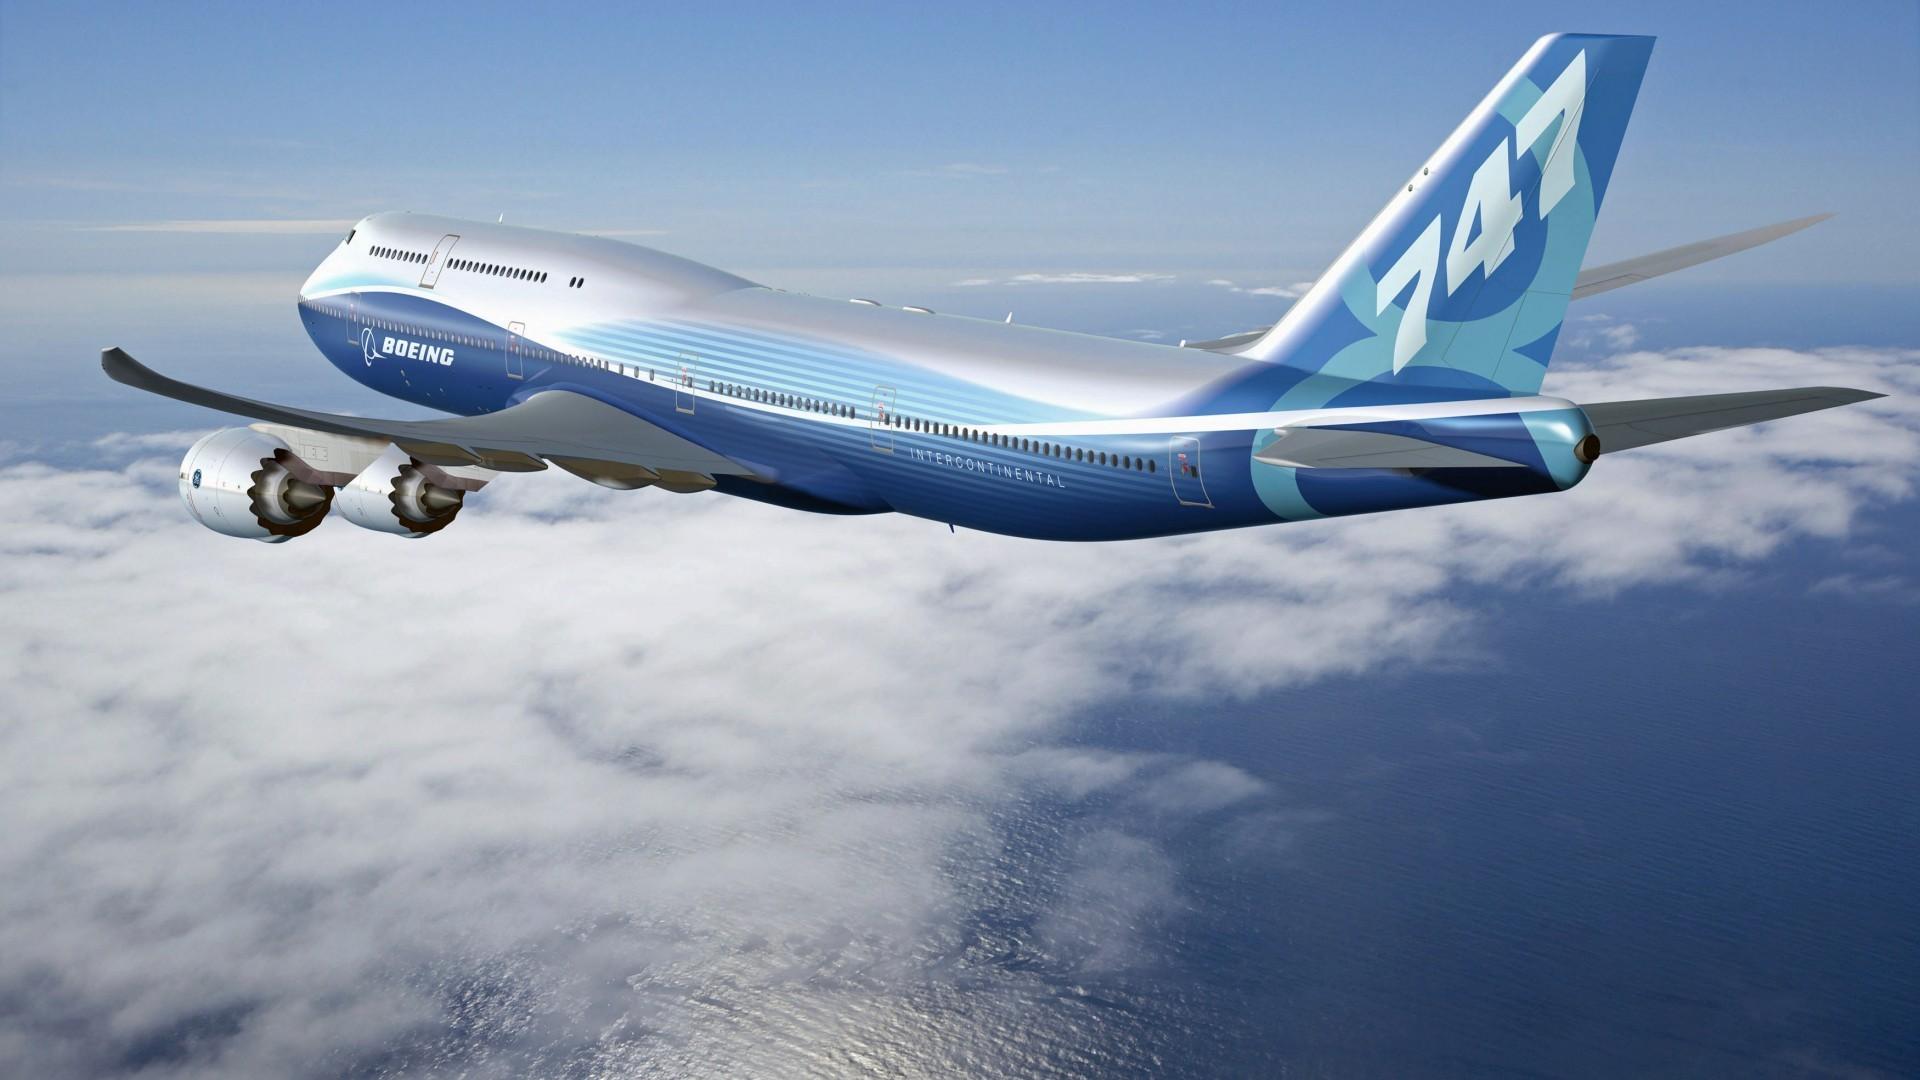 Обои boeing 747. Авиация foto 14